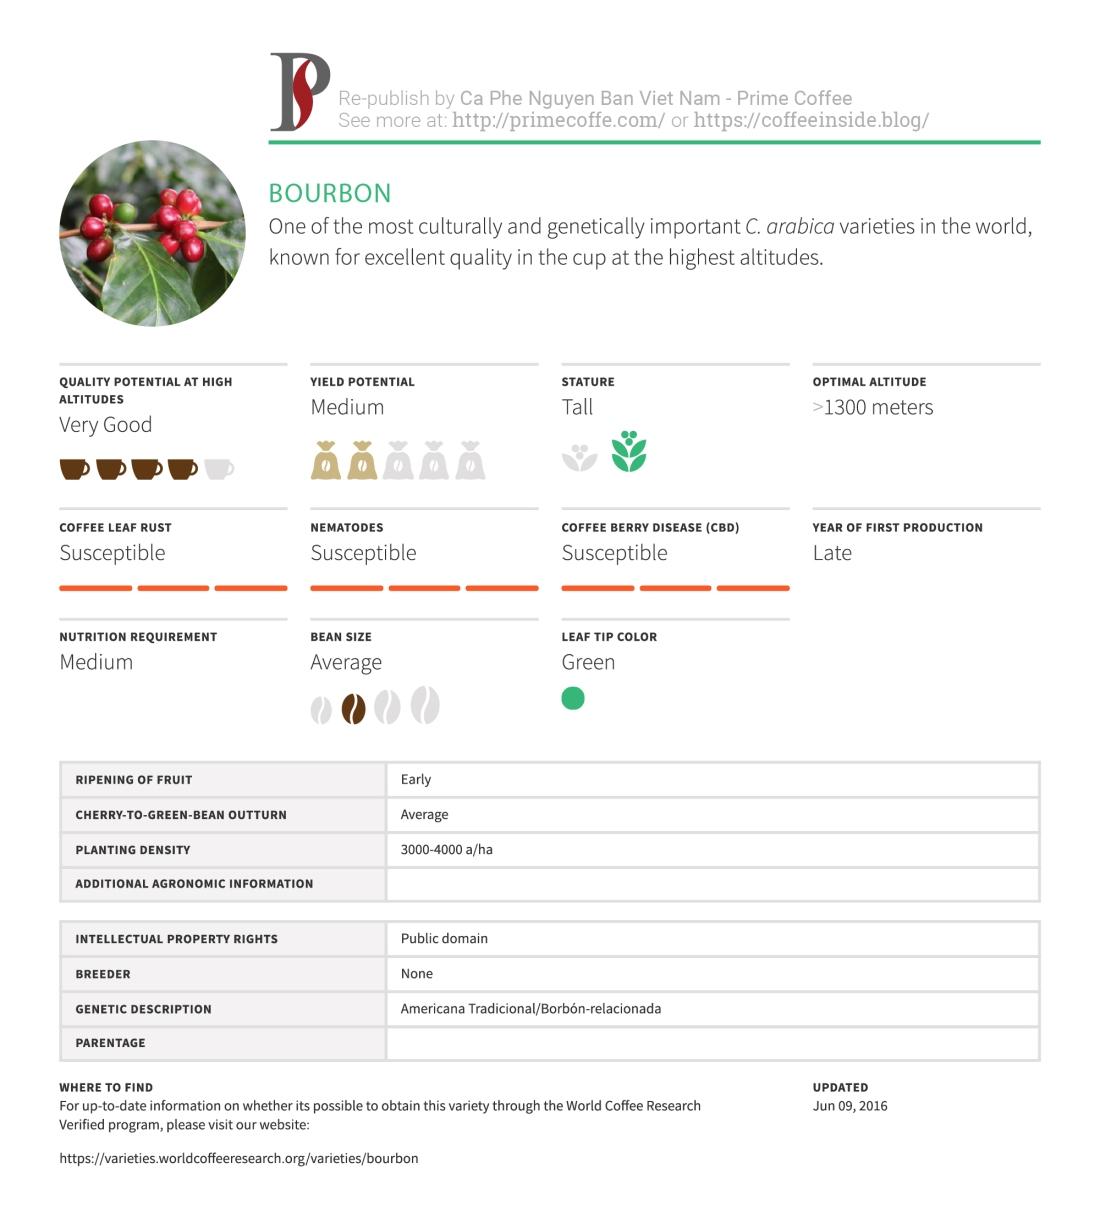 Coffee_Varieties_Bourbon_Infographic-Coffee-Inside